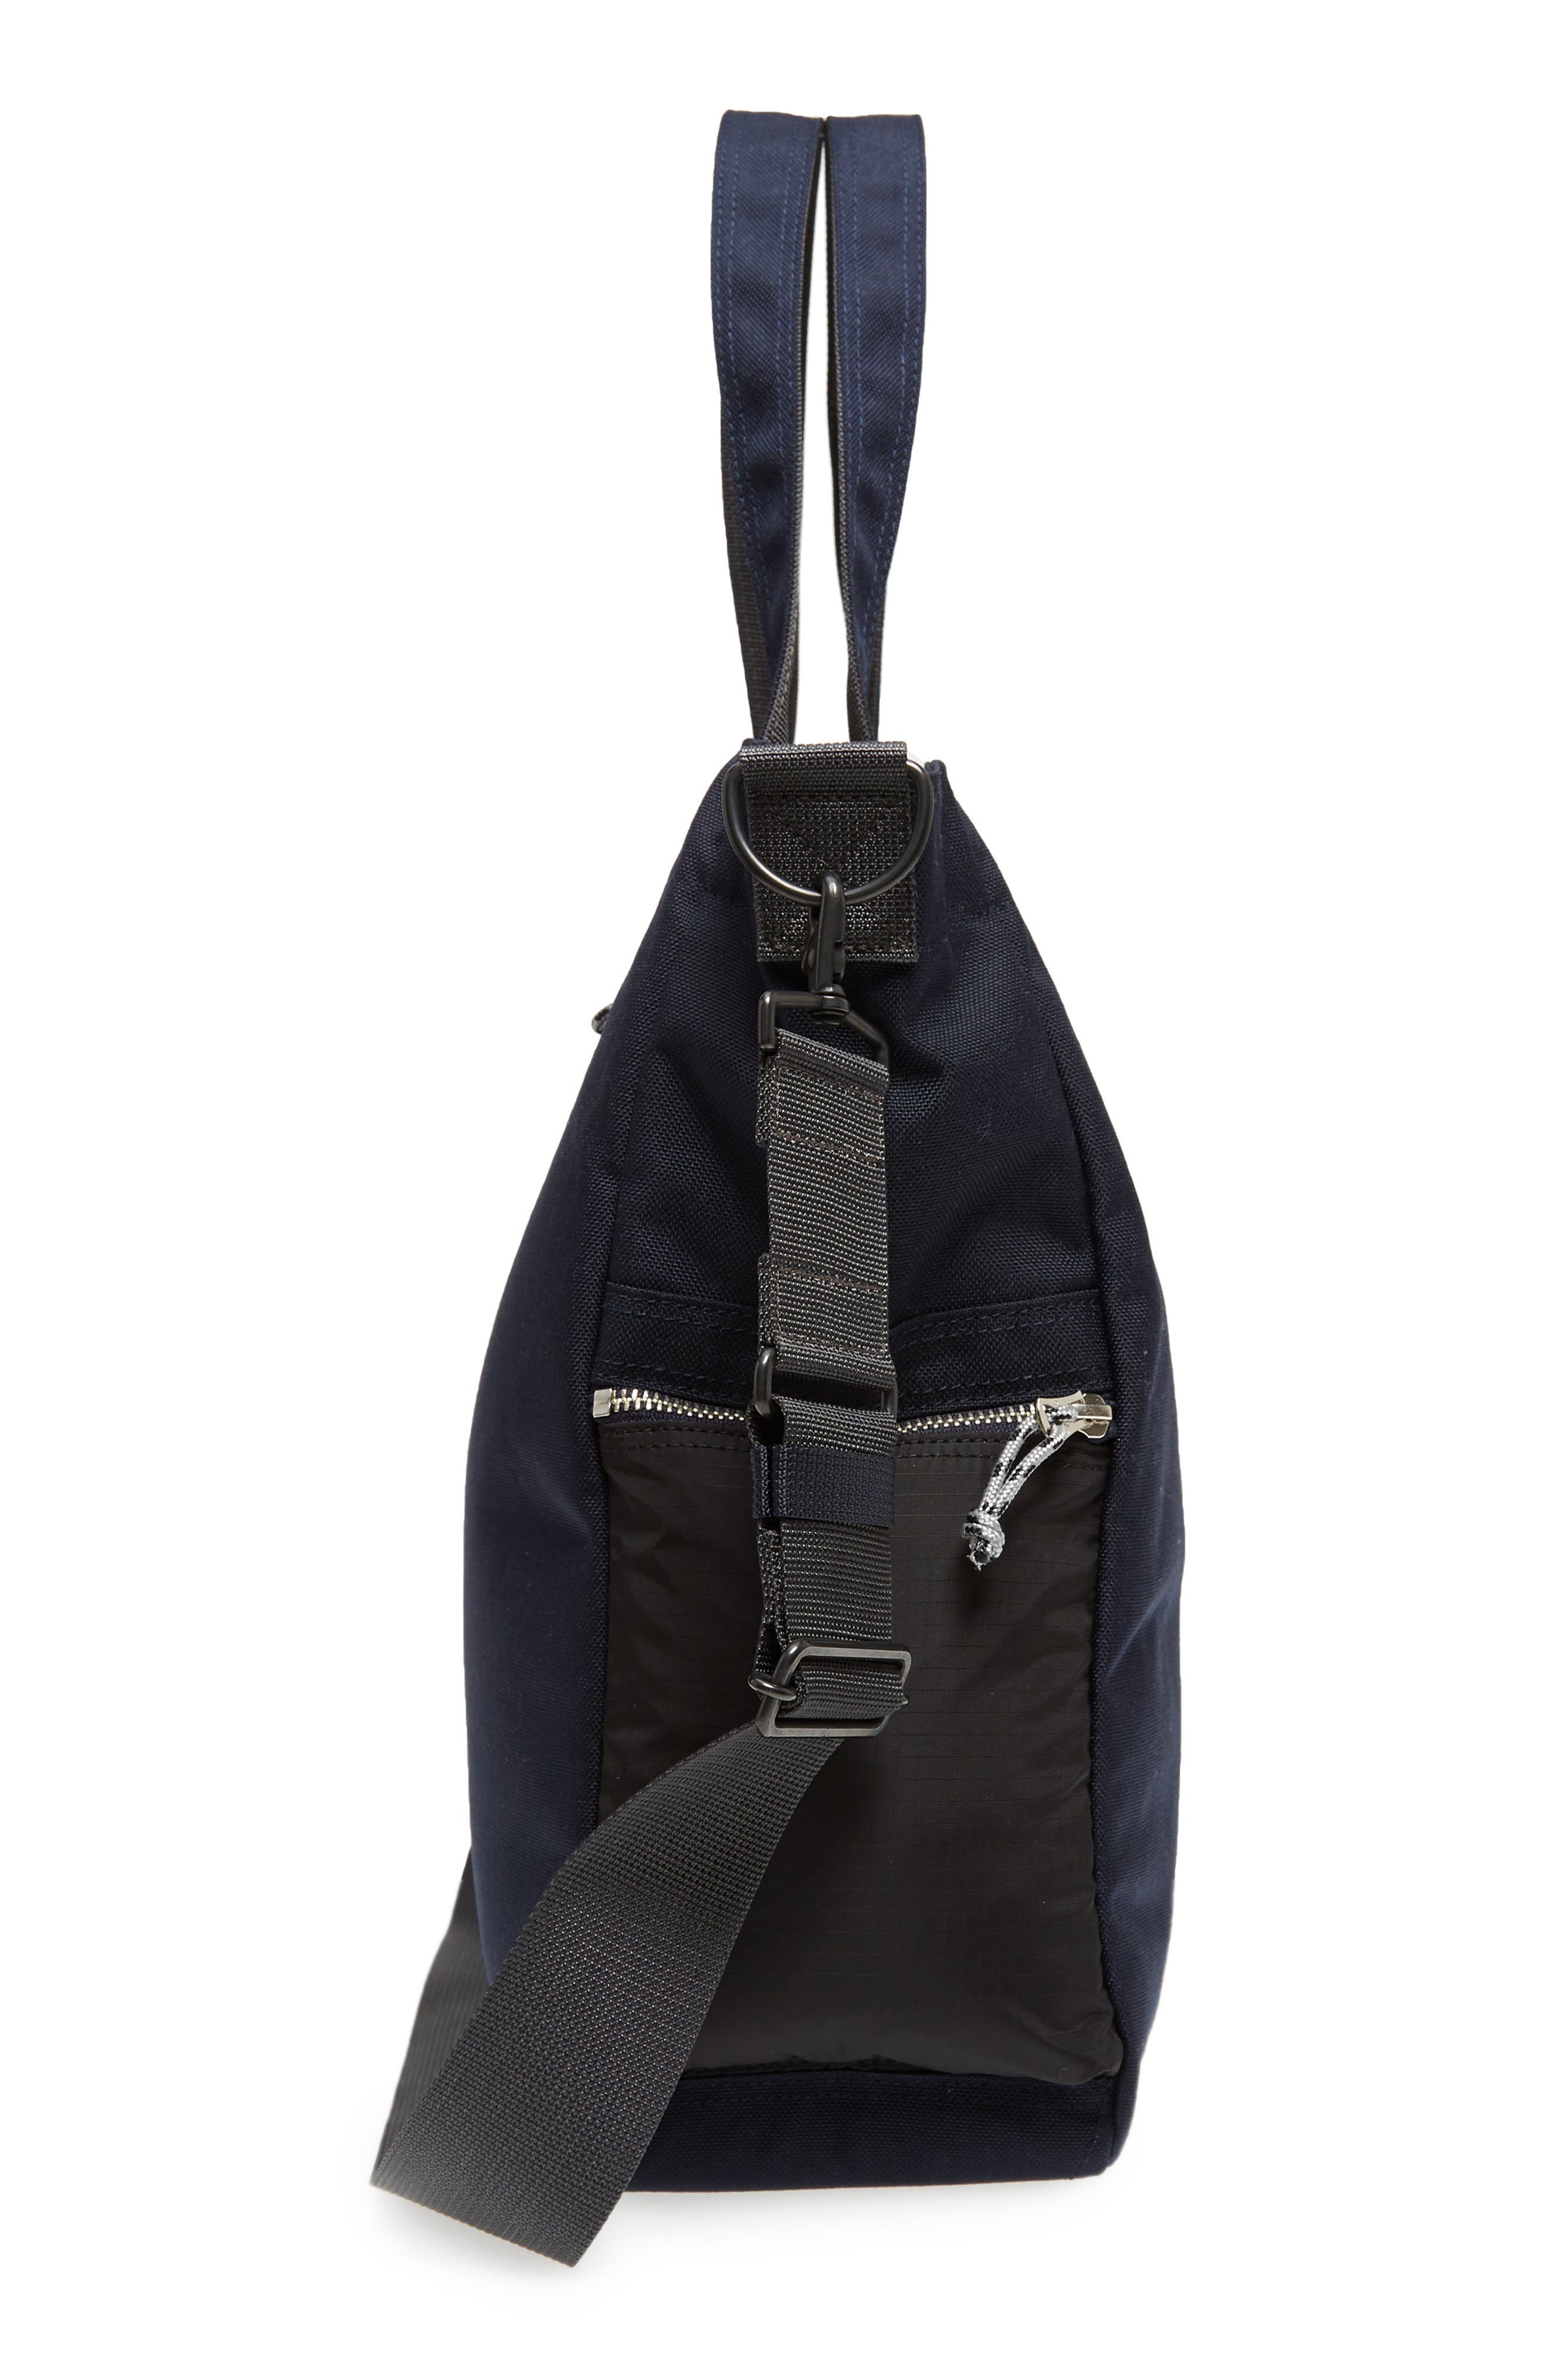 Porter-Yoshida & Co. Hype Tote Bag,                             Alternate thumbnail 5, color,                             Navy/ Black